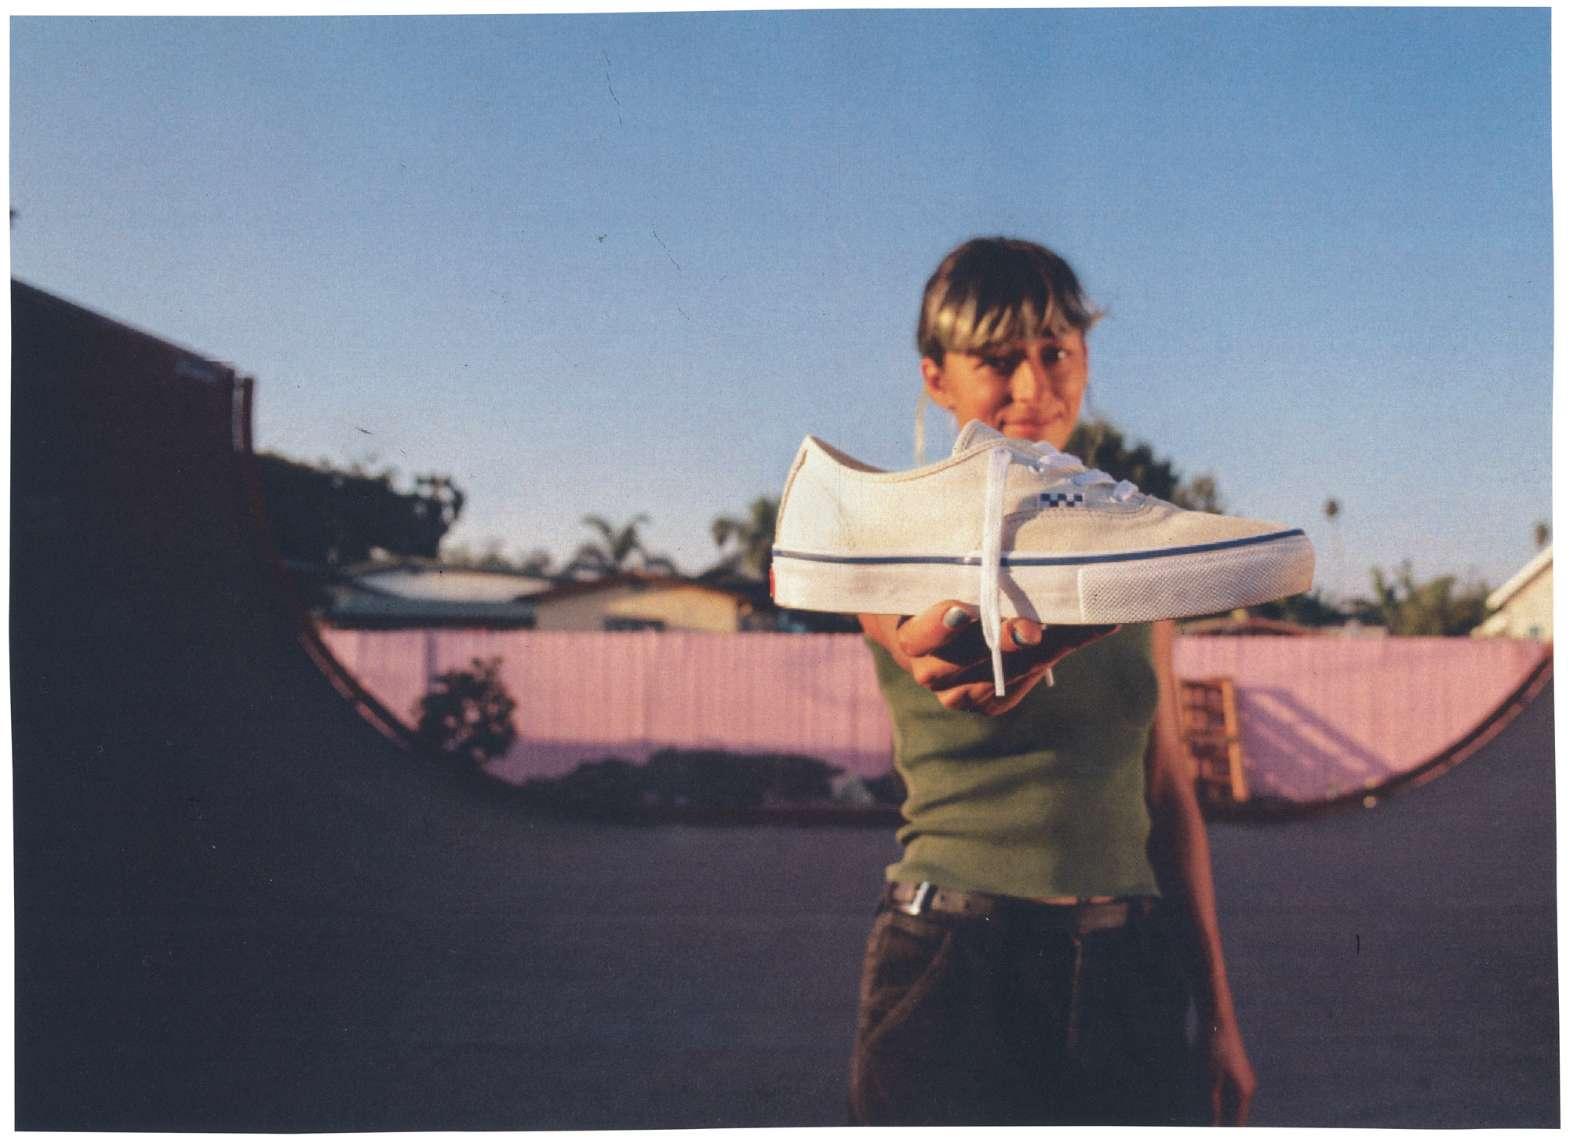 Lizzy Armanto x Skate Authentic